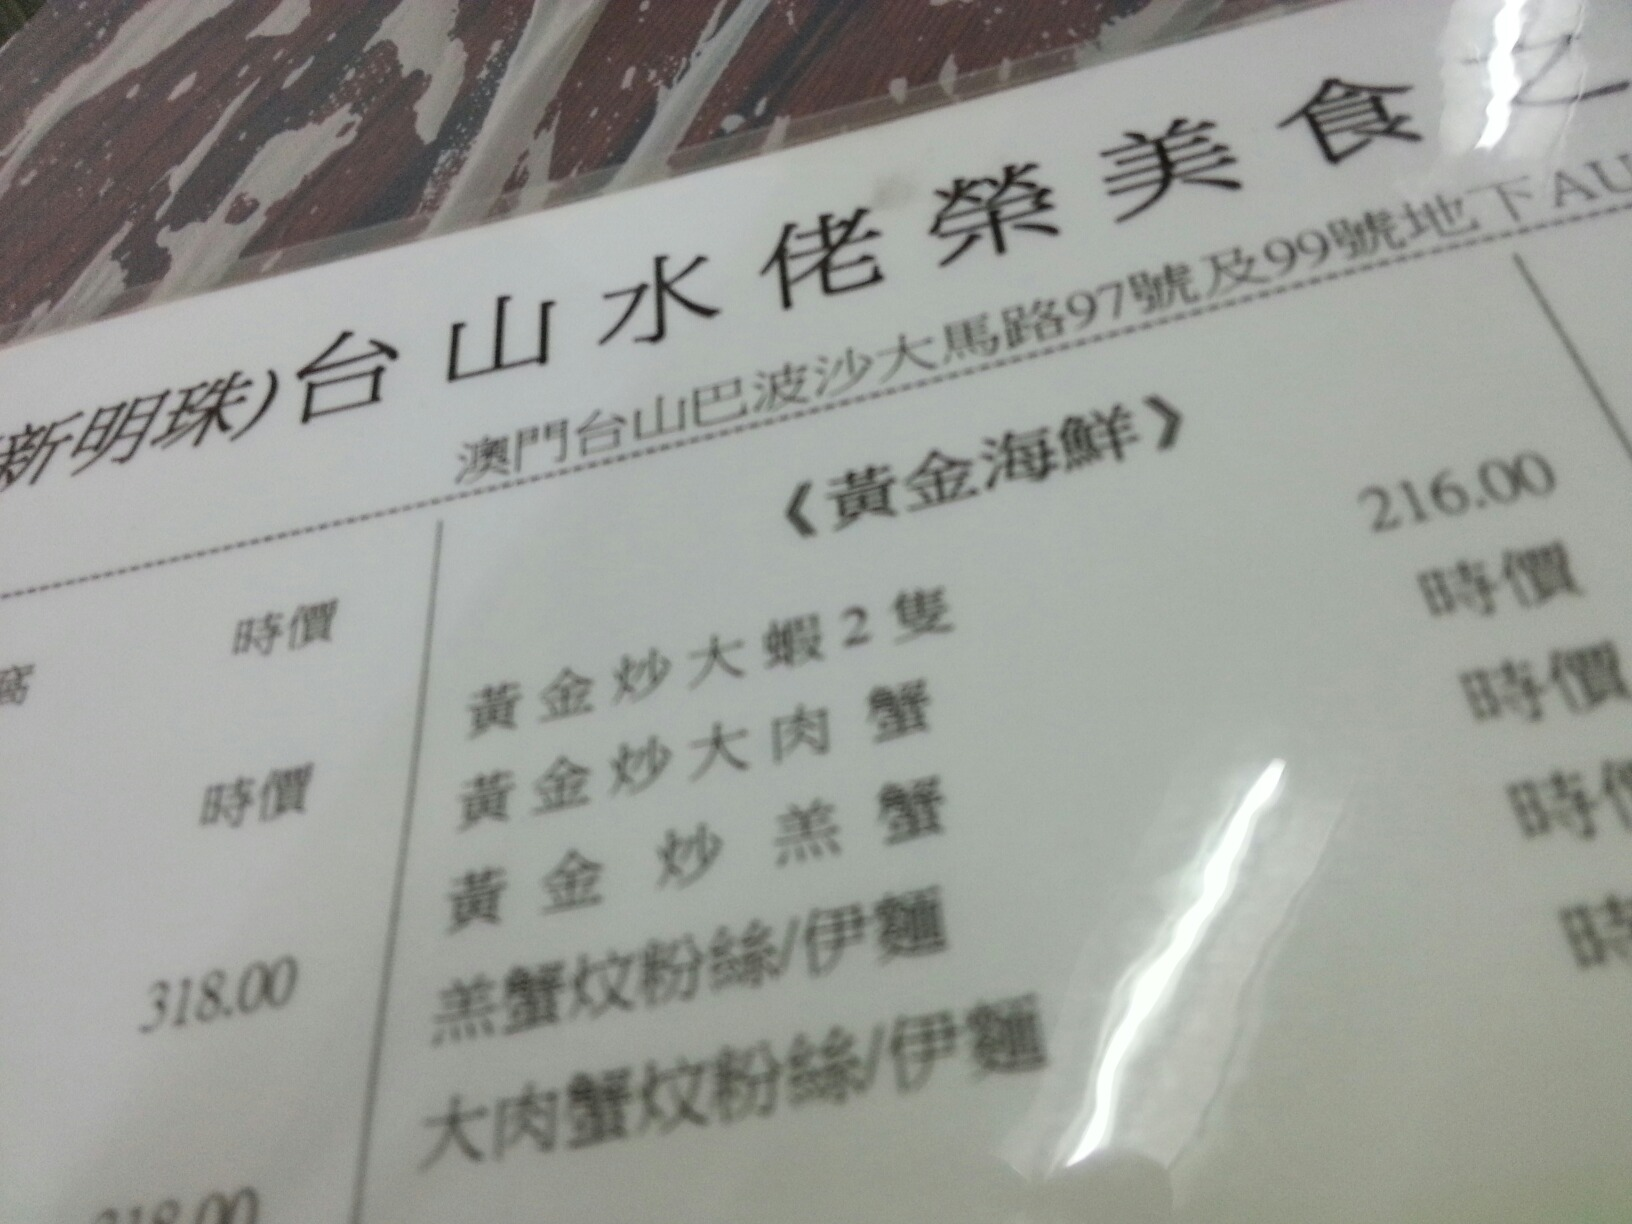 16g内存条正品价格_折扣_图片_分期付款-苏宁易购